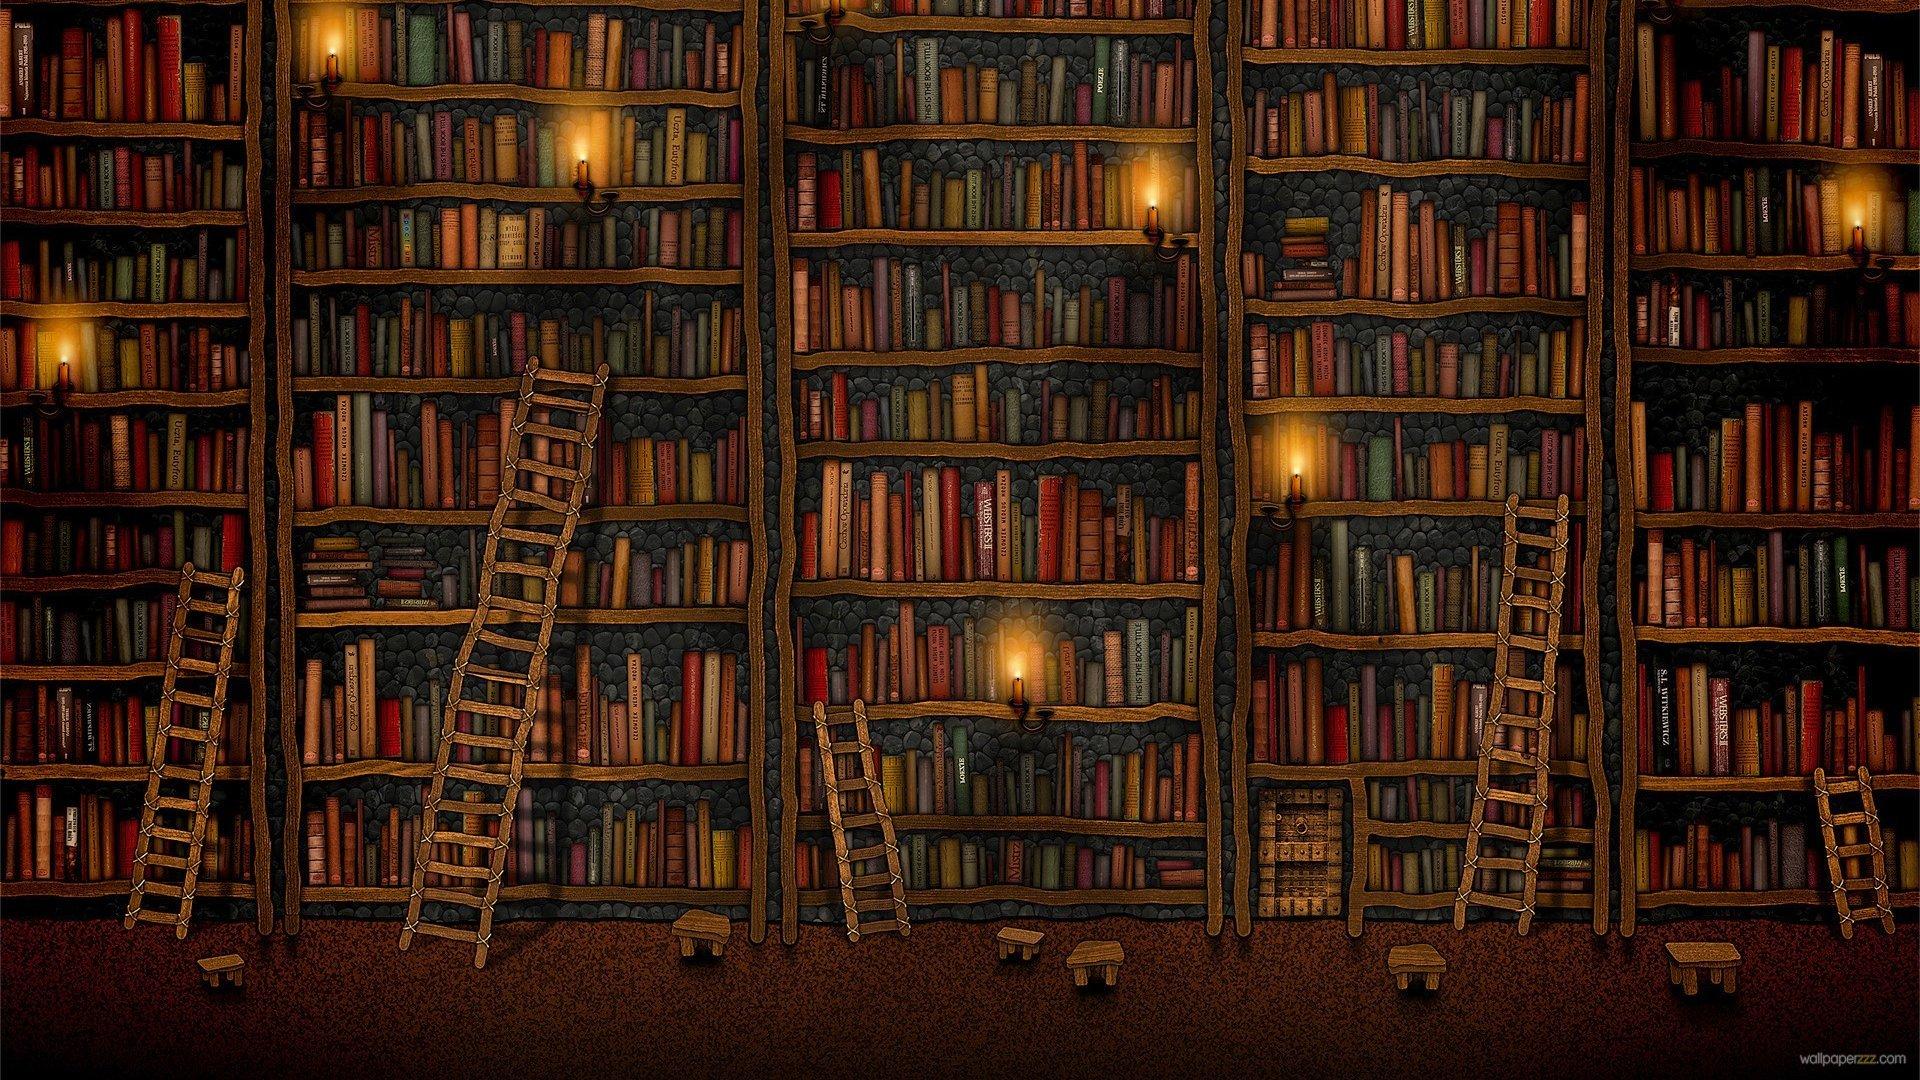 41 Hd Library Wallpaper On Wallpapersafari